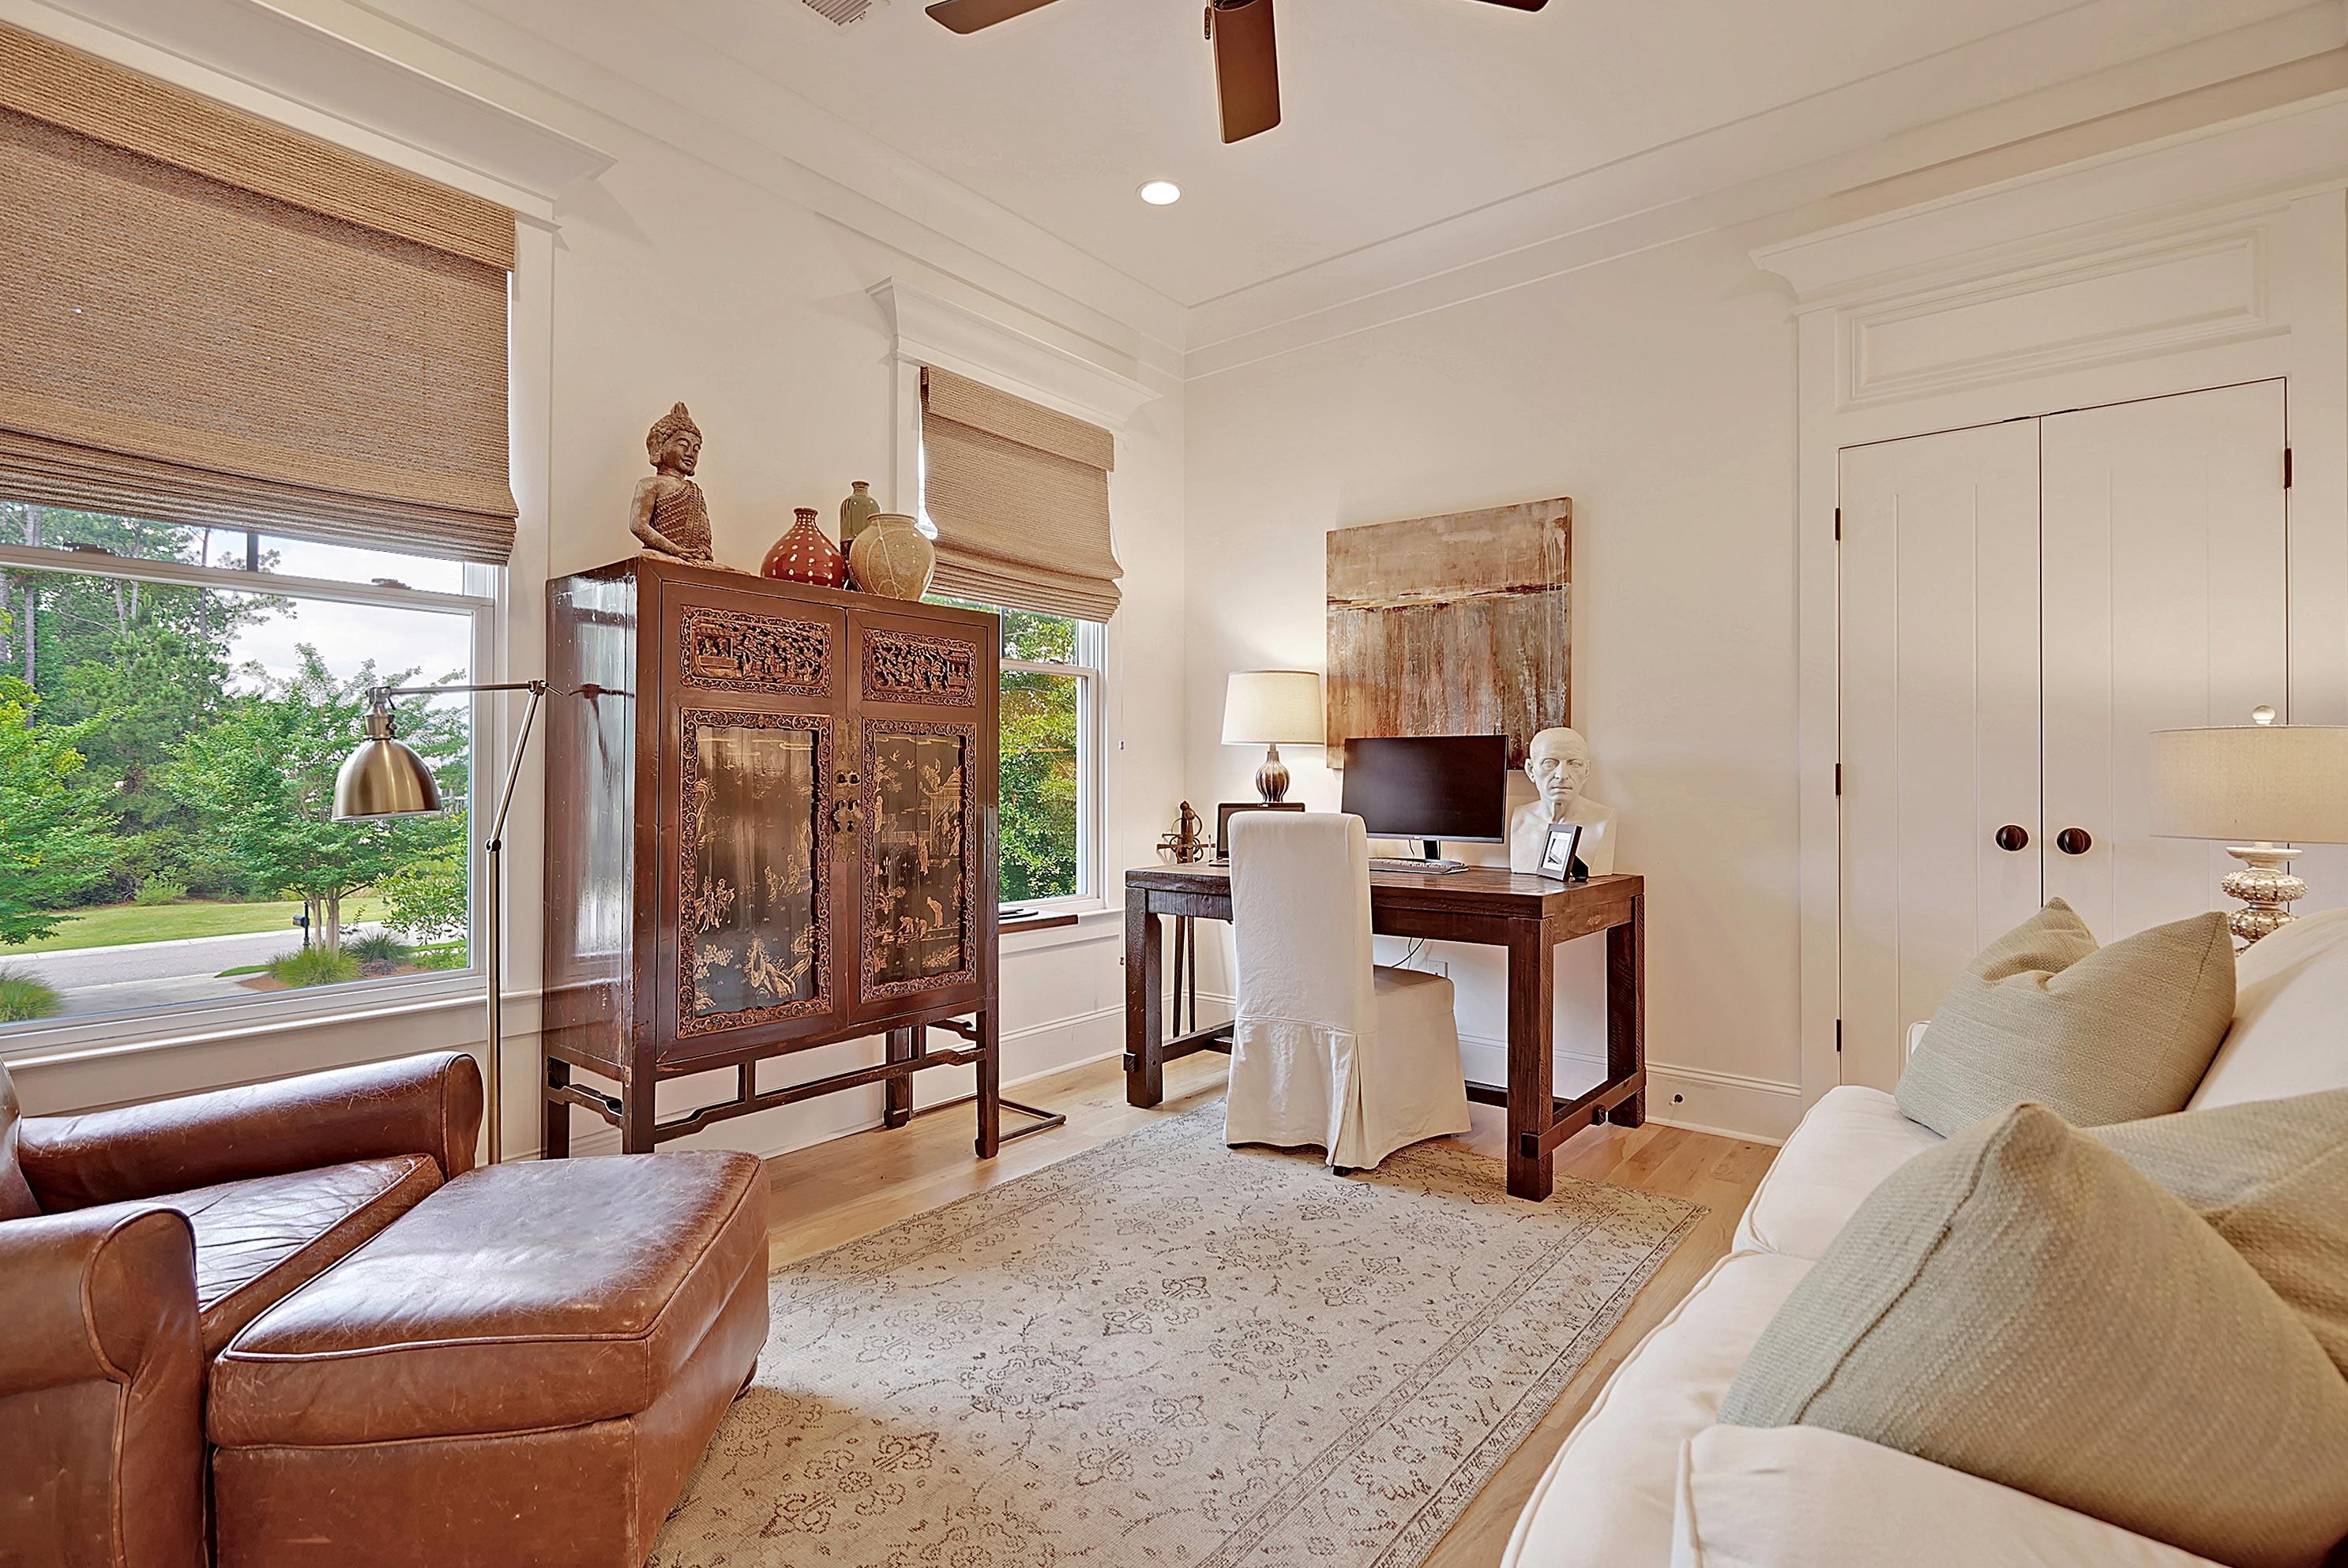 Grassy Creek Homes For Sale - 294 River Oak, Mount Pleasant, SC - 52